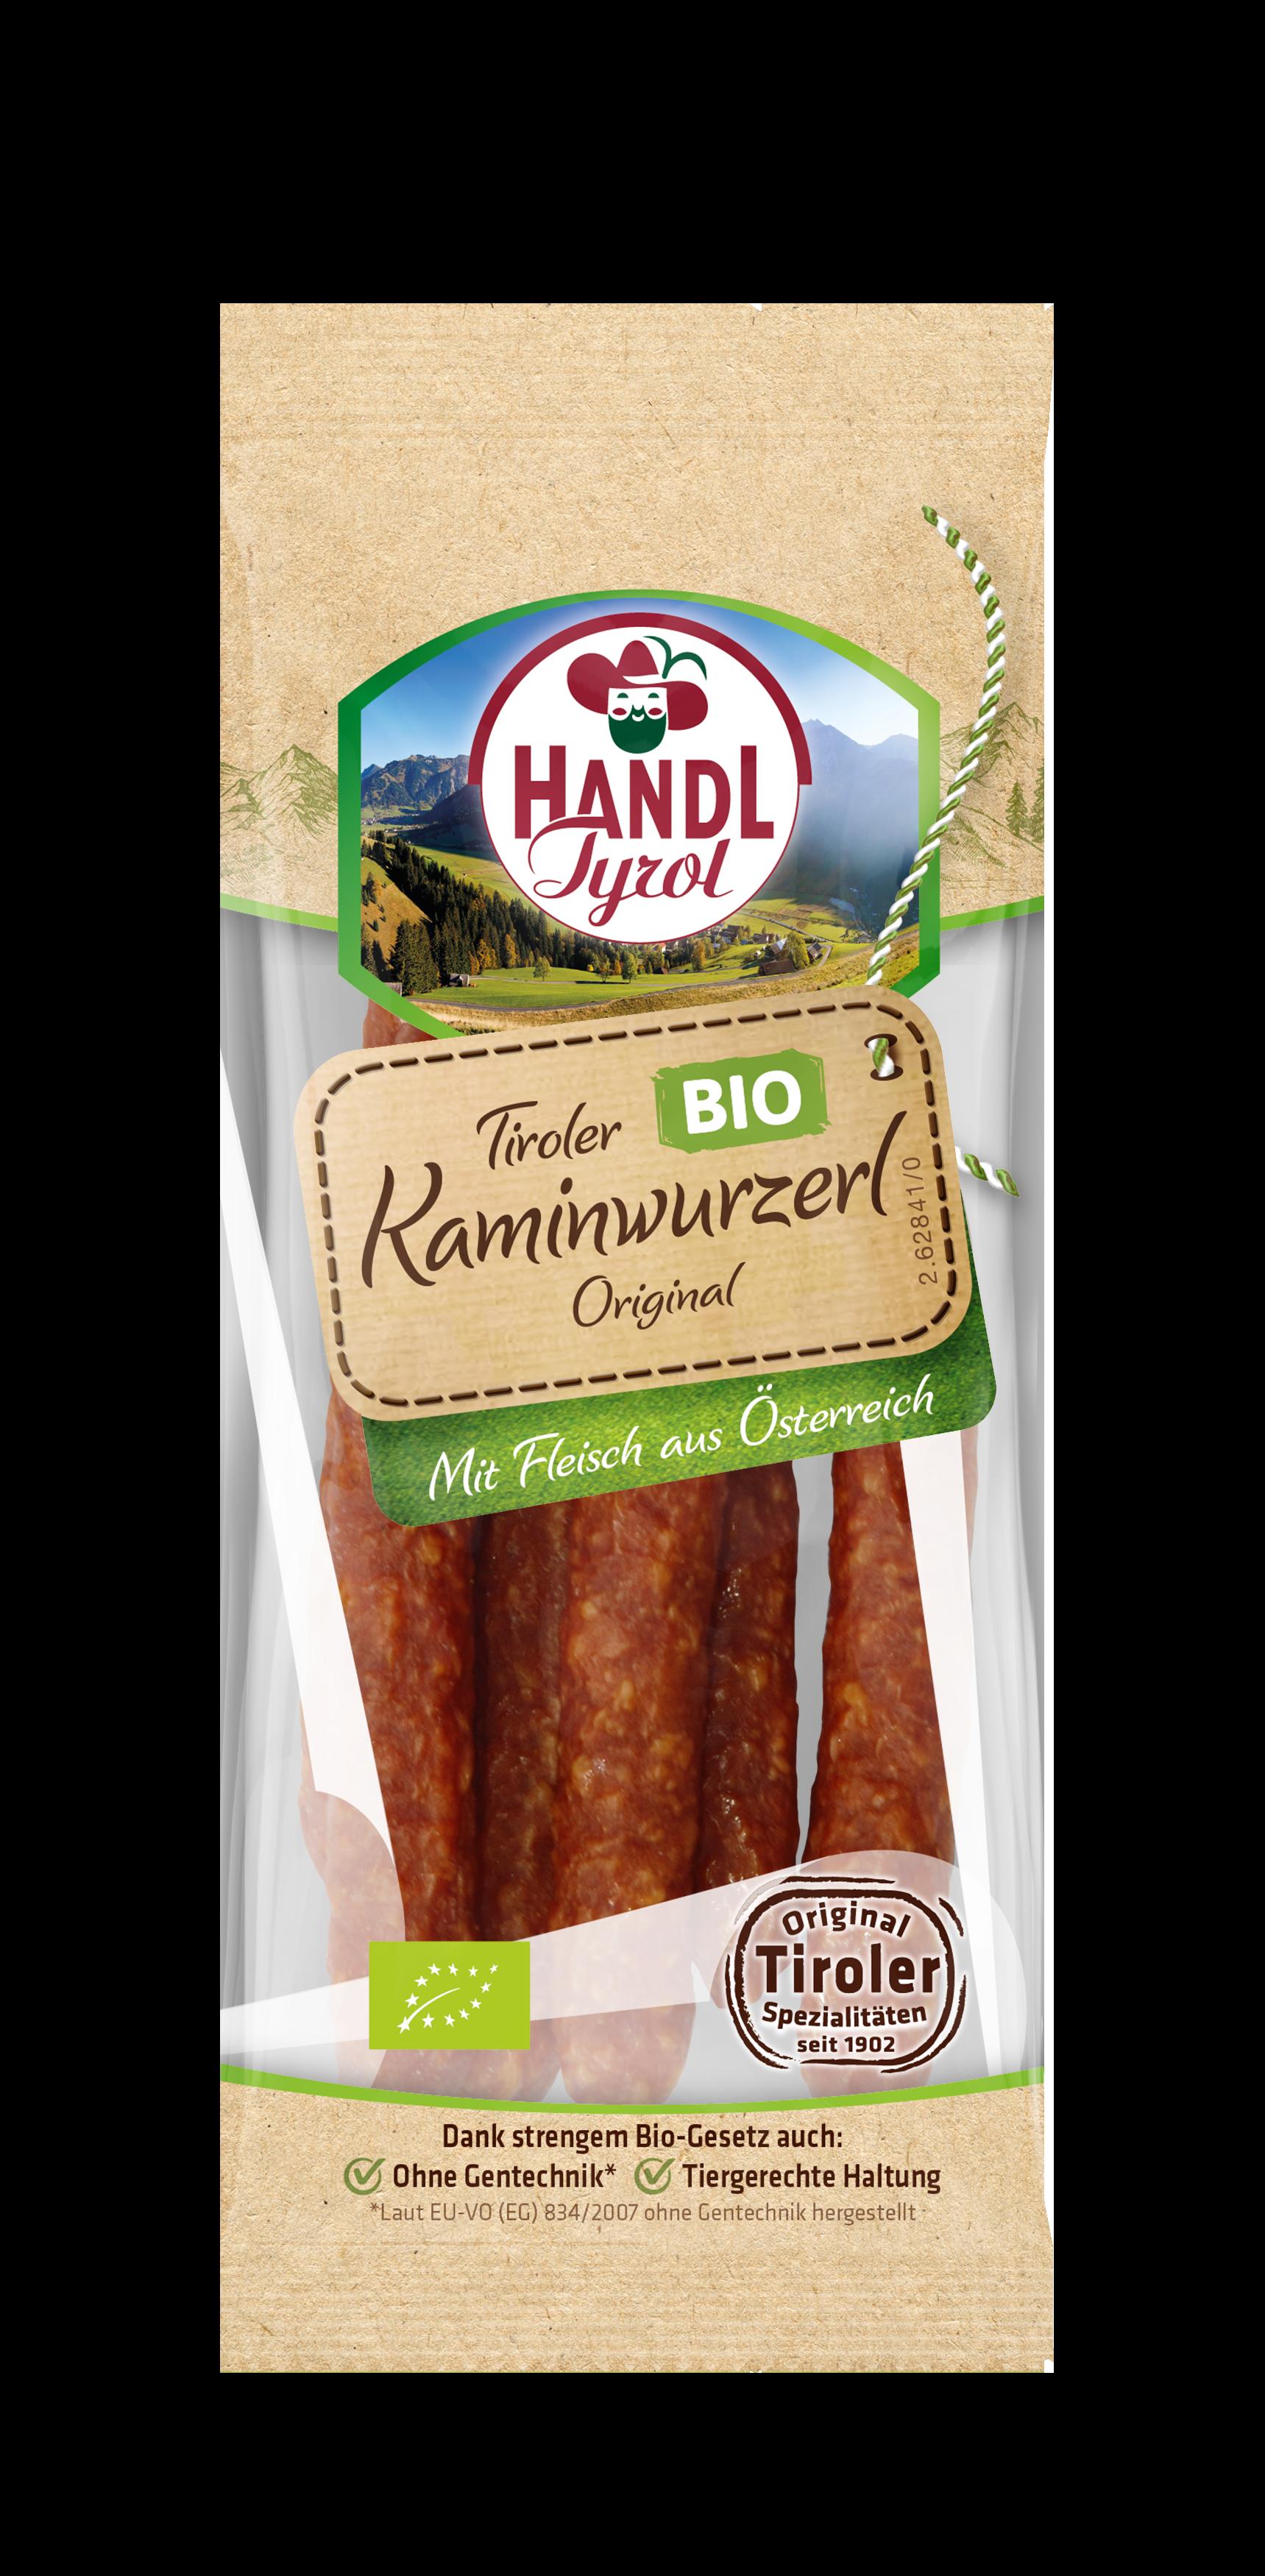 HANDL_TYROL_Bio_Kaminwurzerl.png